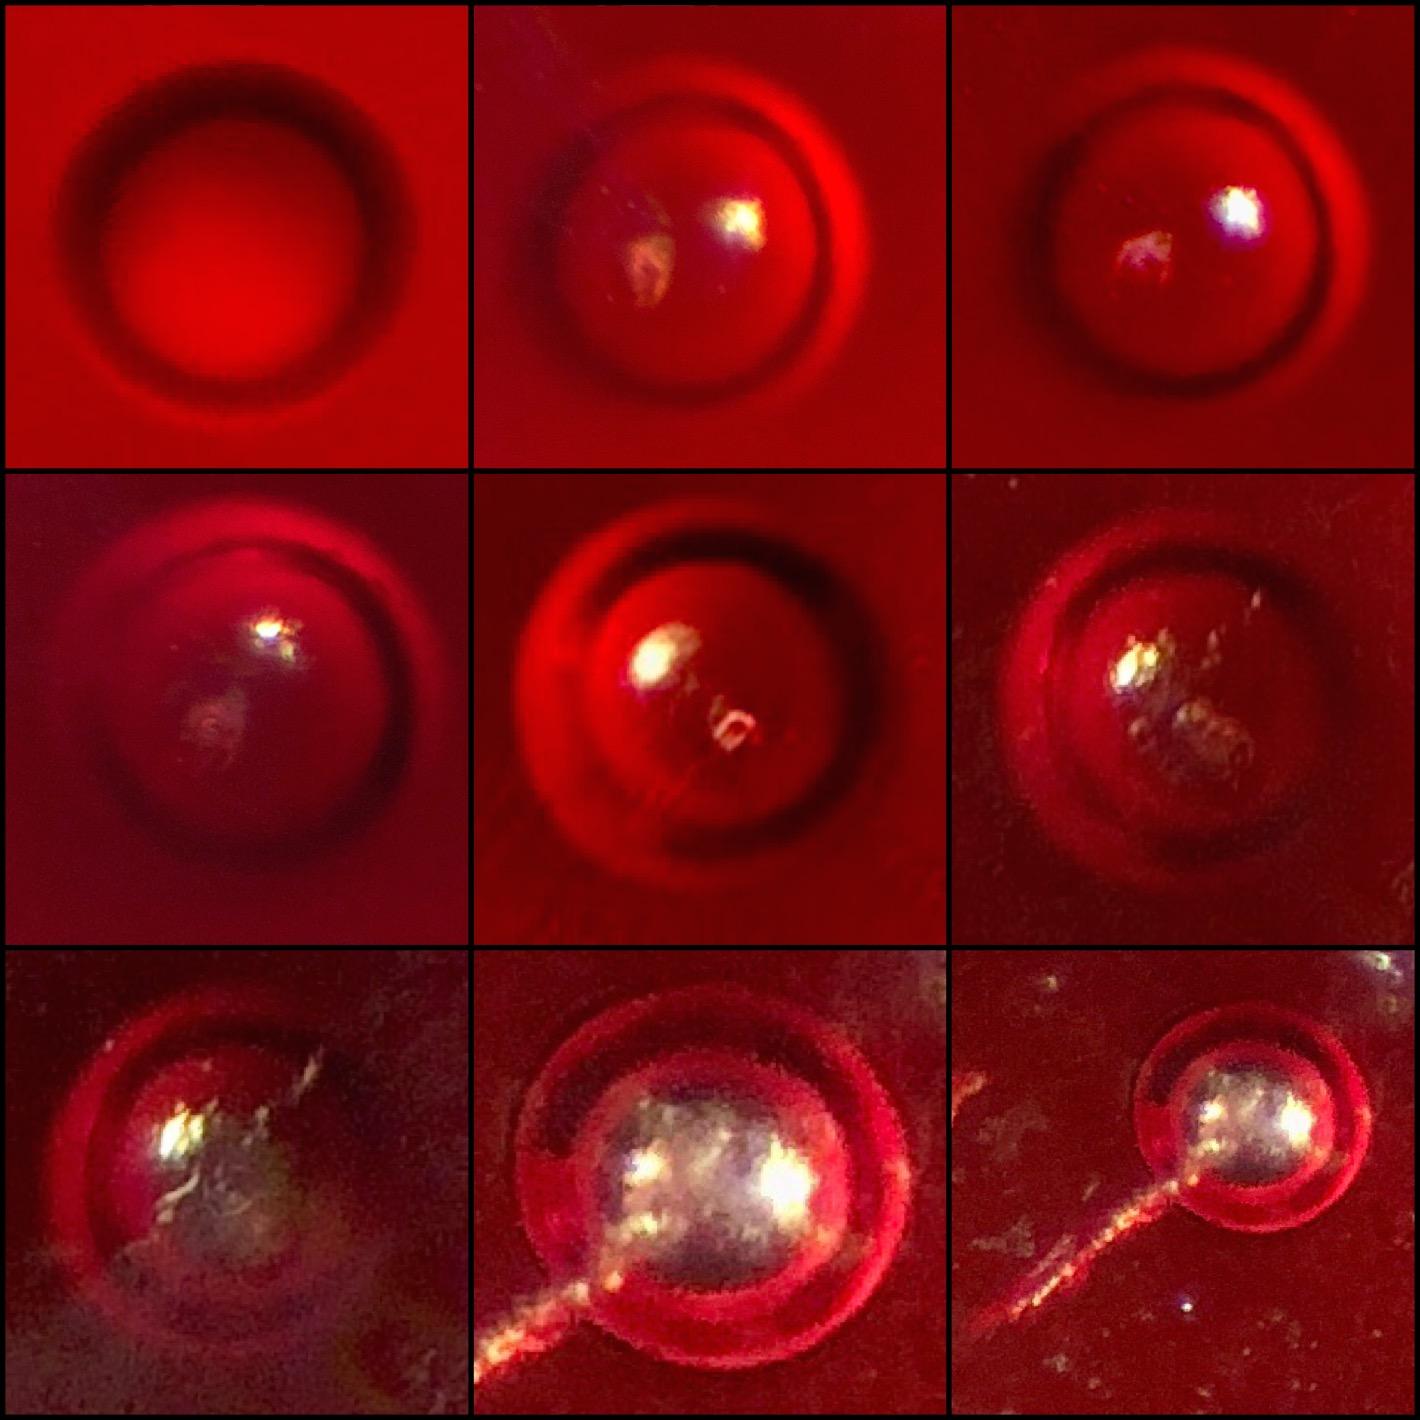 Microscopic Photos oc Round Skin Parasite OVA Hatching